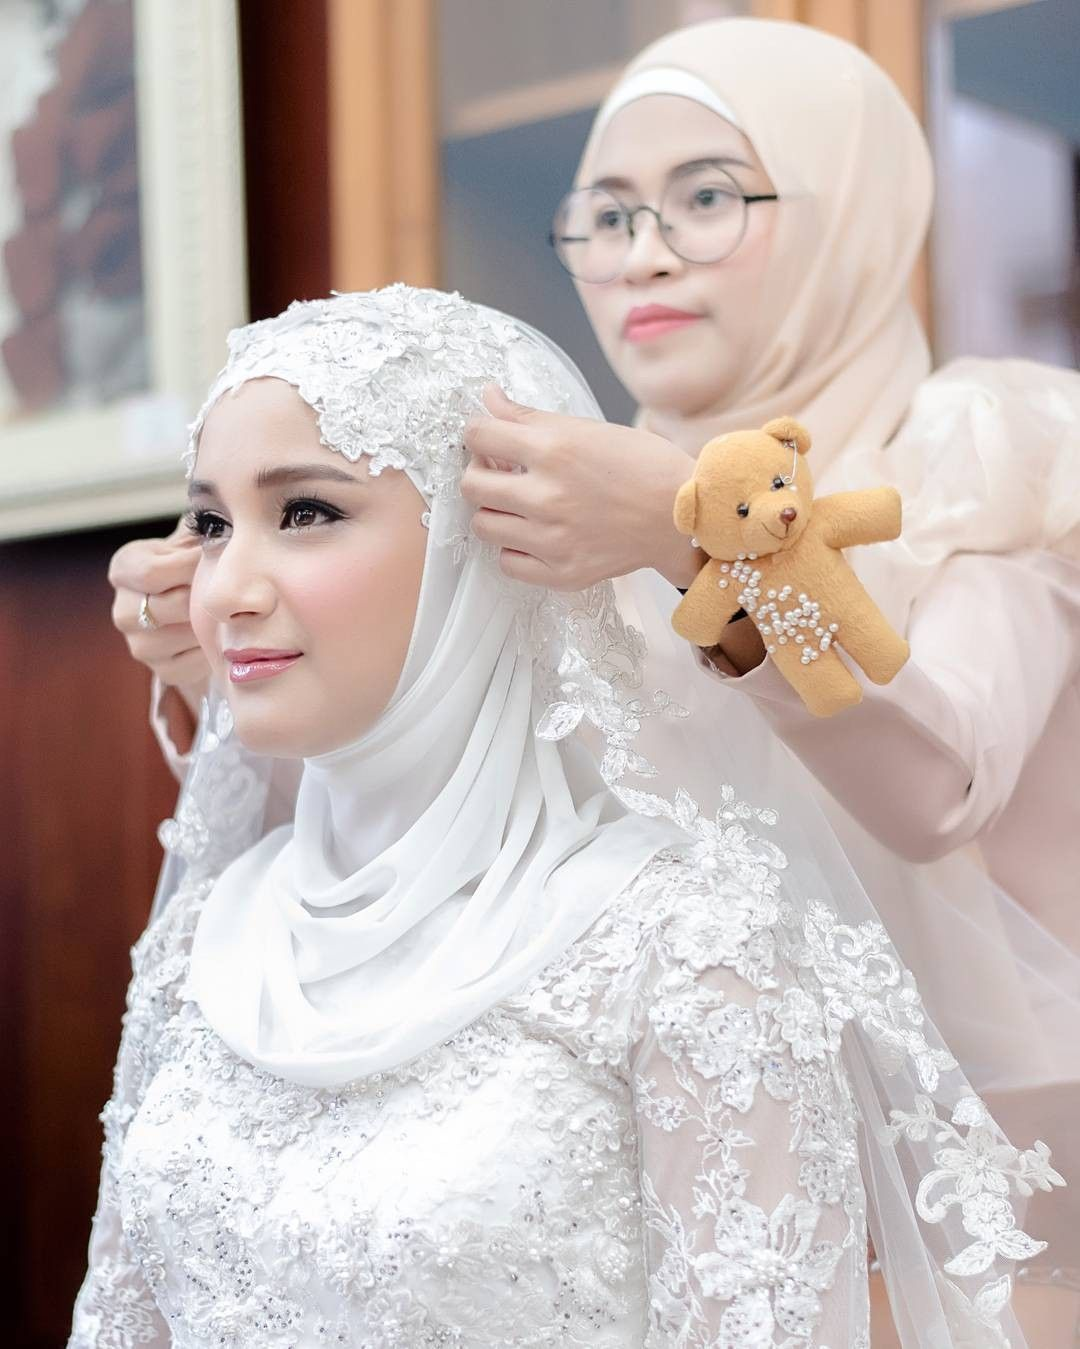 Pin by Raja Farisha on Hijab style   Pinterest   Muslim, Wedding and ...